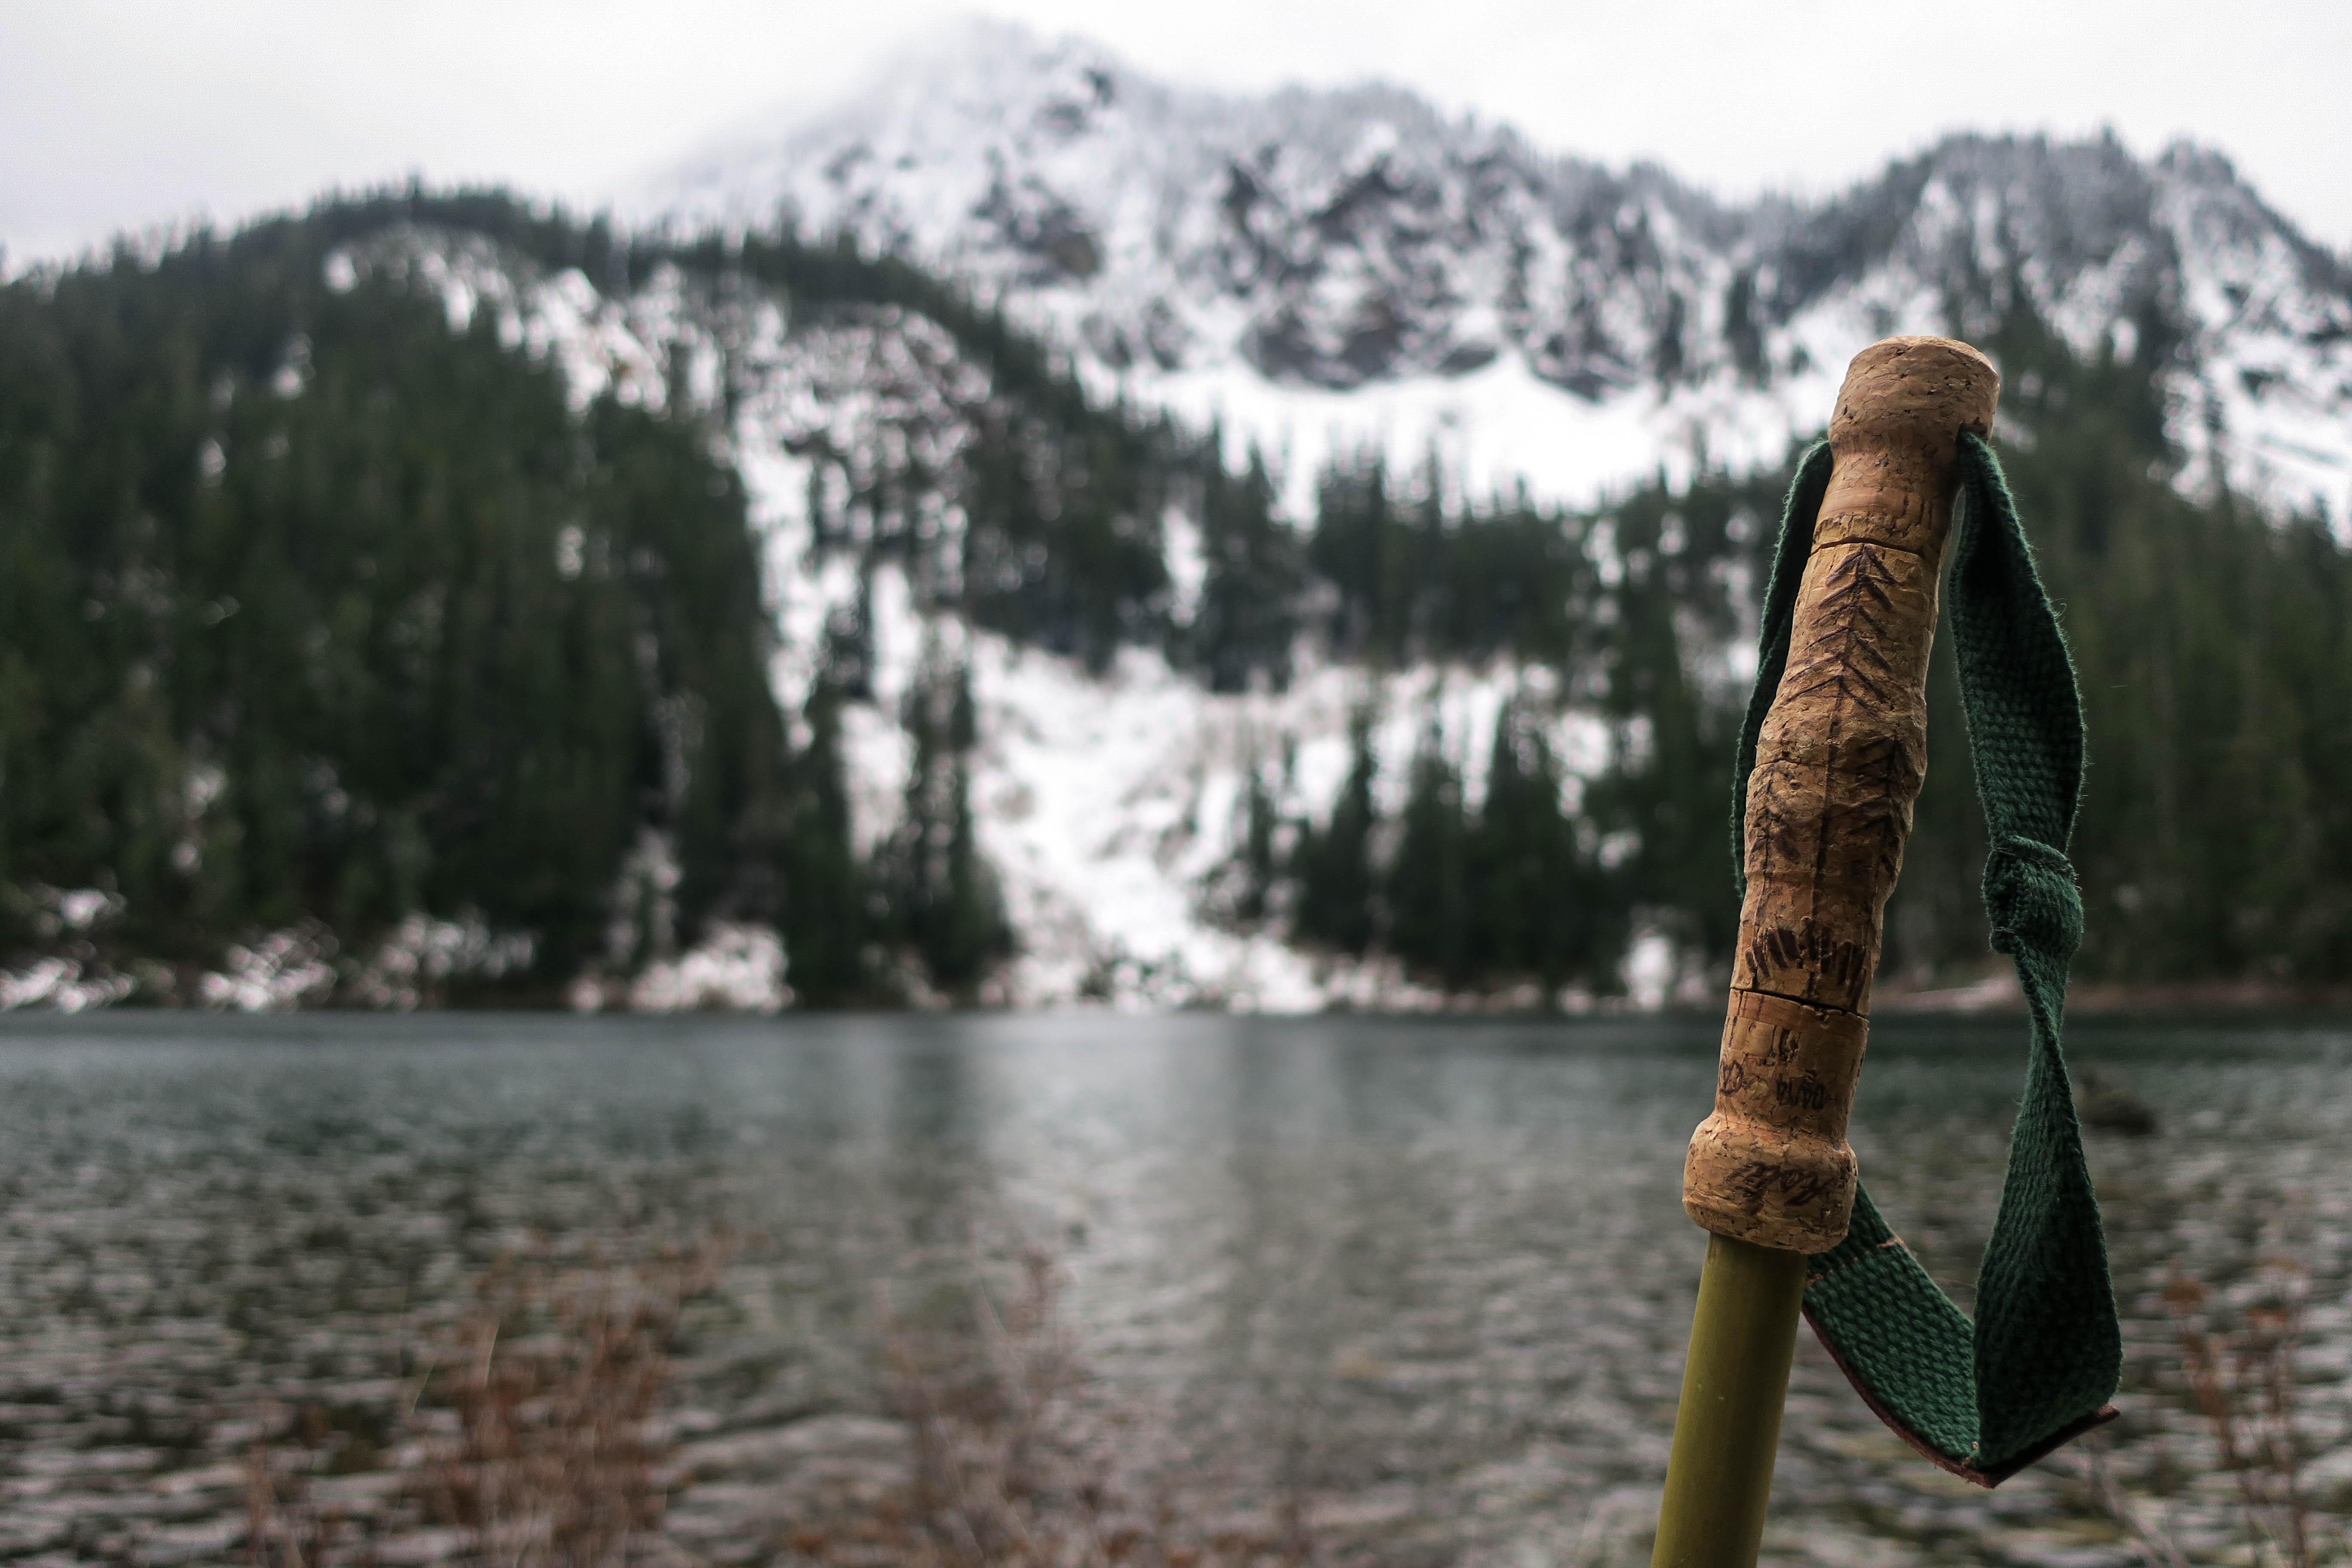 Uphill Designs - Alpine bamboo and cork trekking poles - in nature